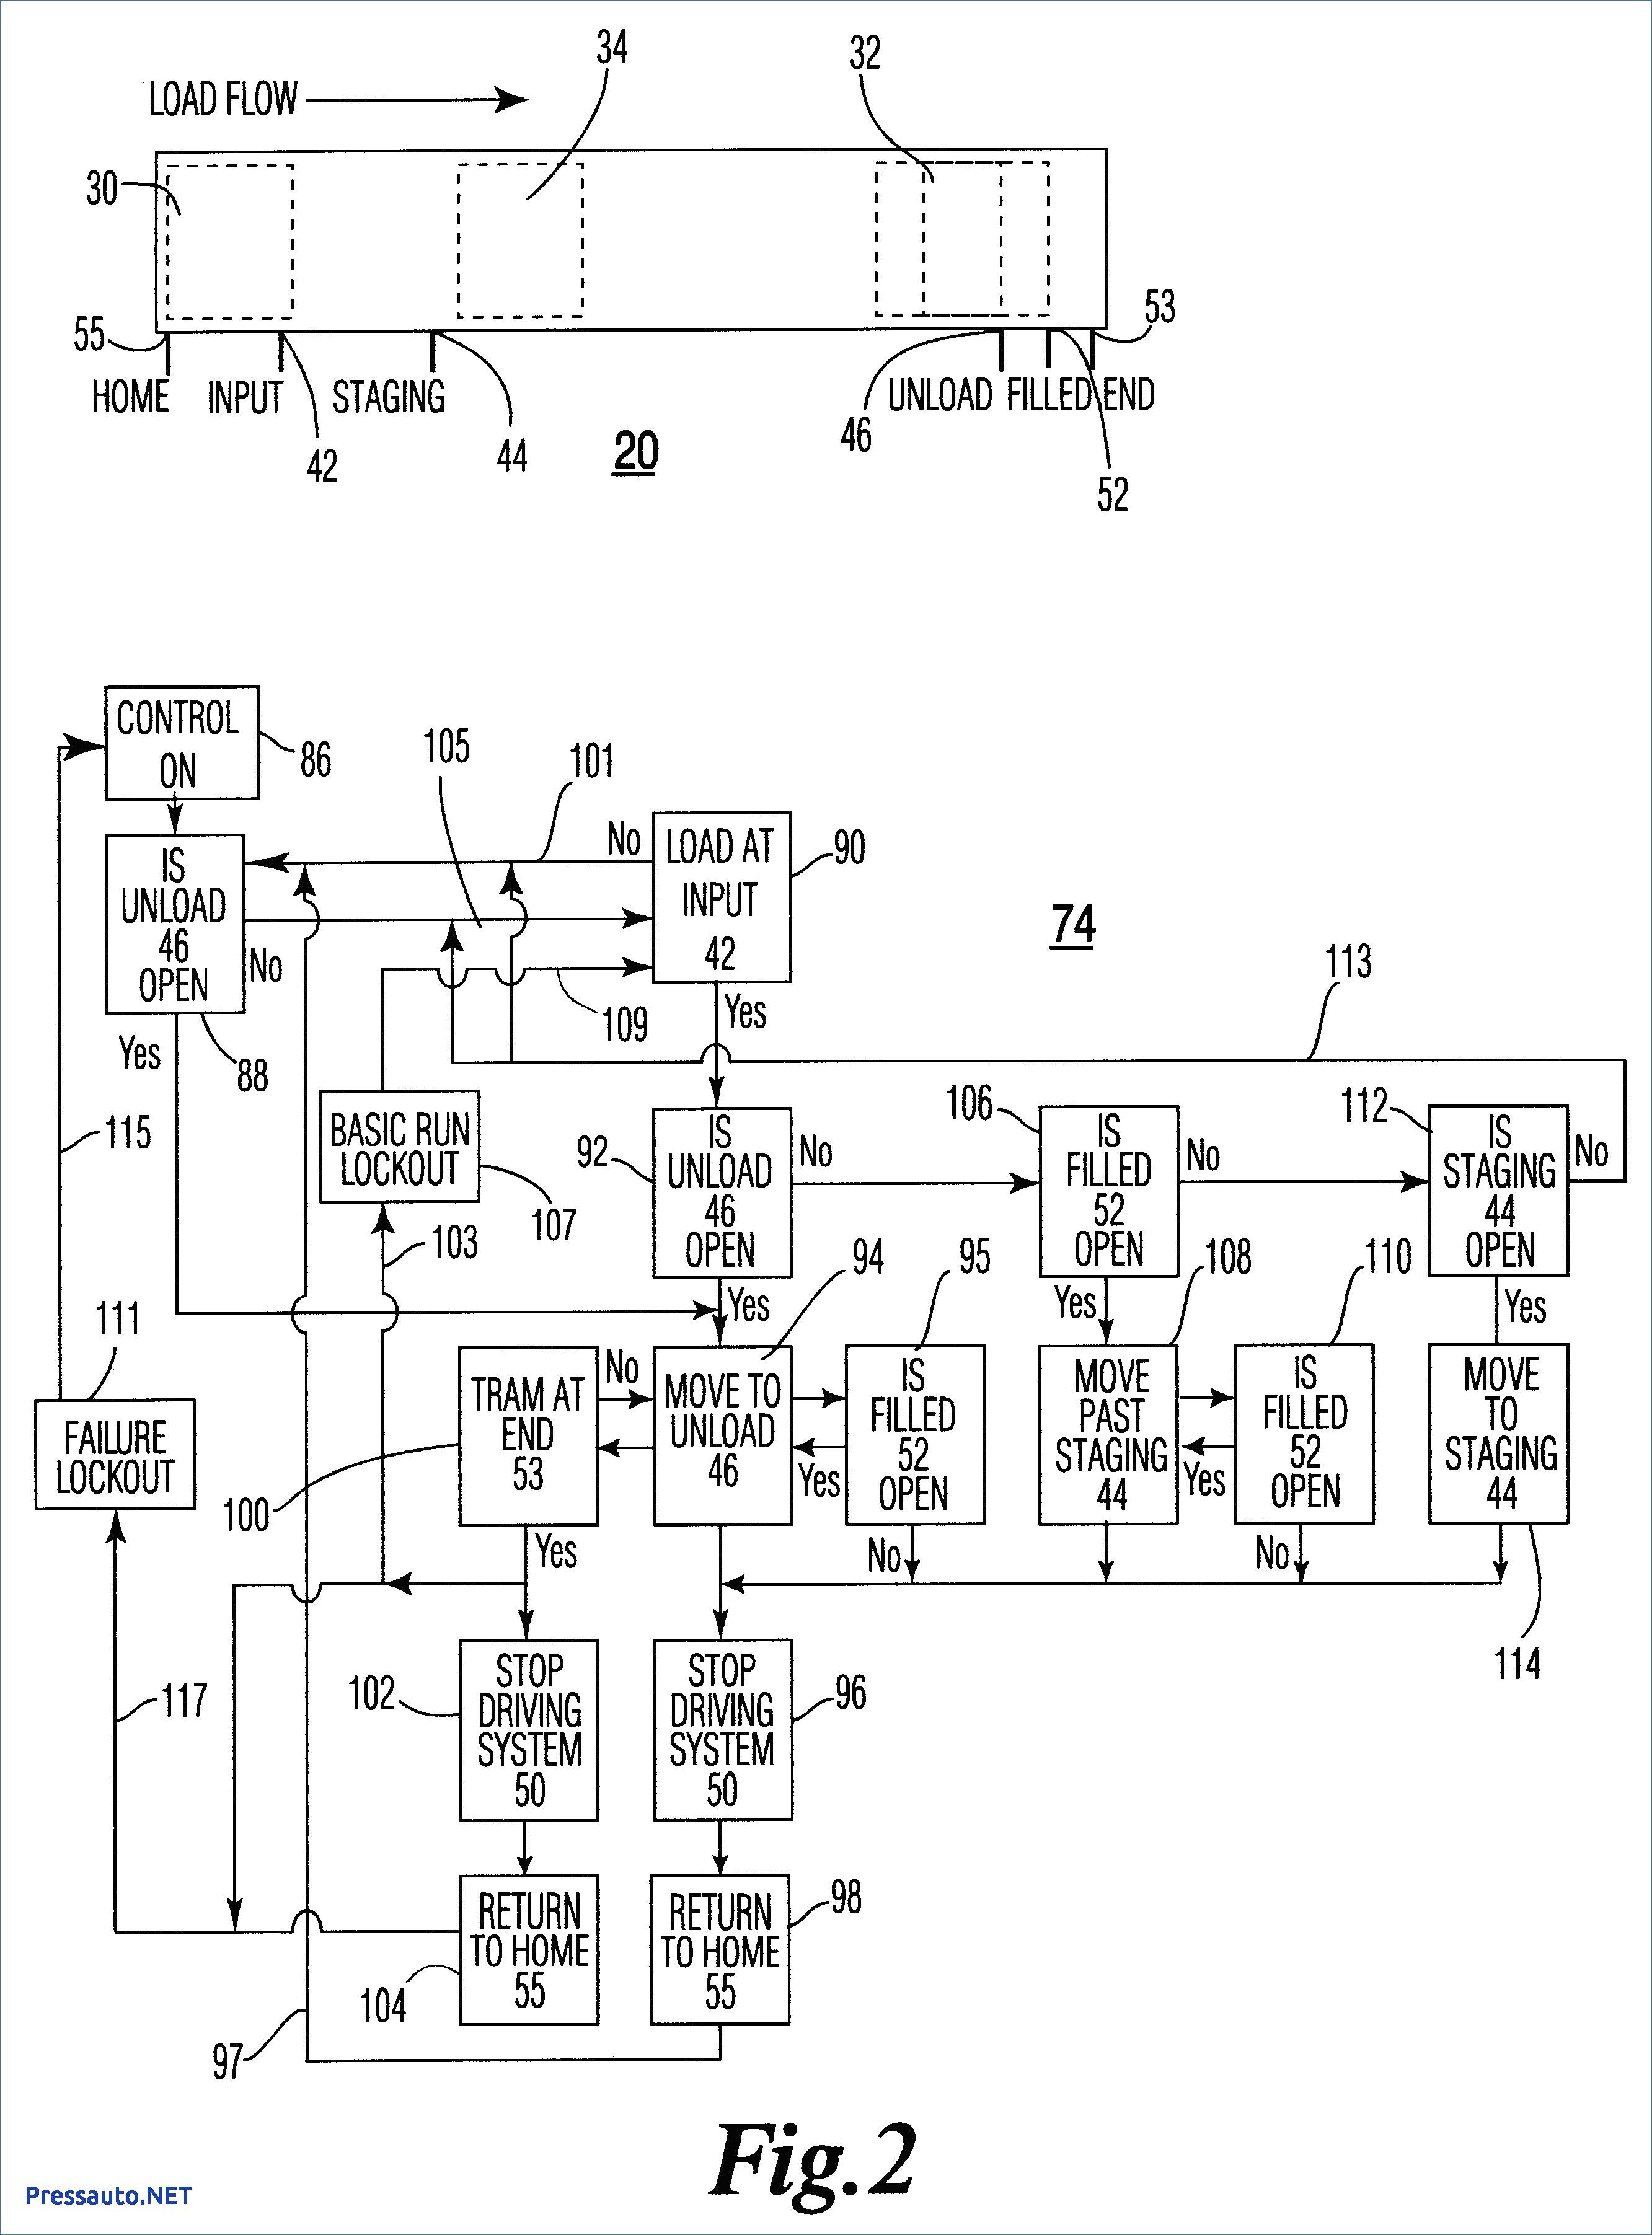 buck boost transformer connection diagram john deere f525 mower wiring gallery